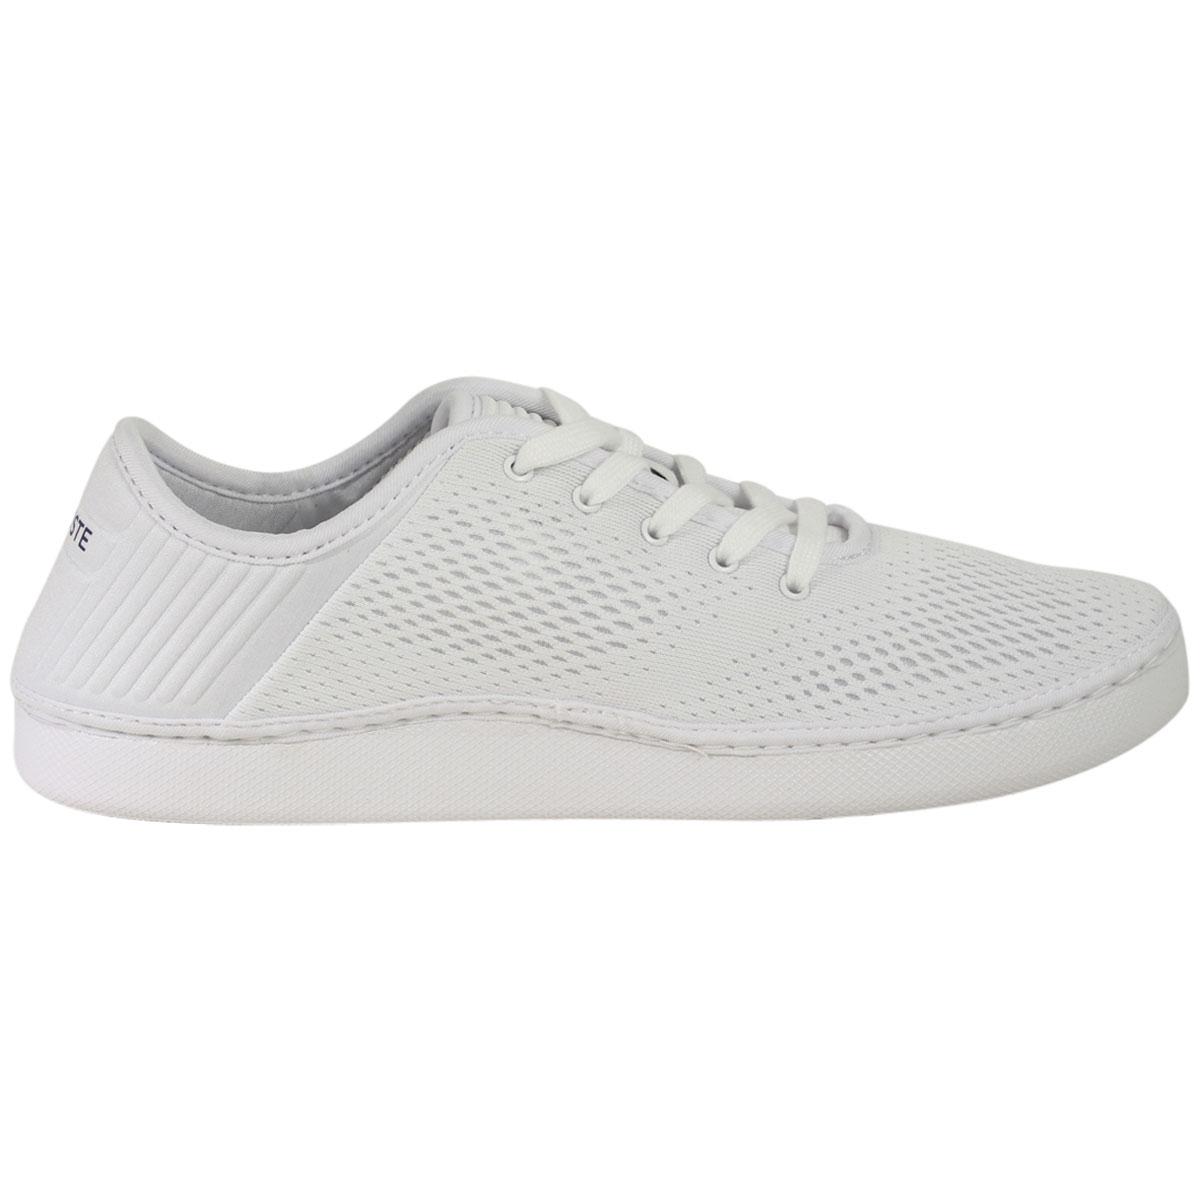 Lacoste-Men-039-s-L-Ydro-Lace-118-Trainers-Sneakers-Shoes thumbnail 25